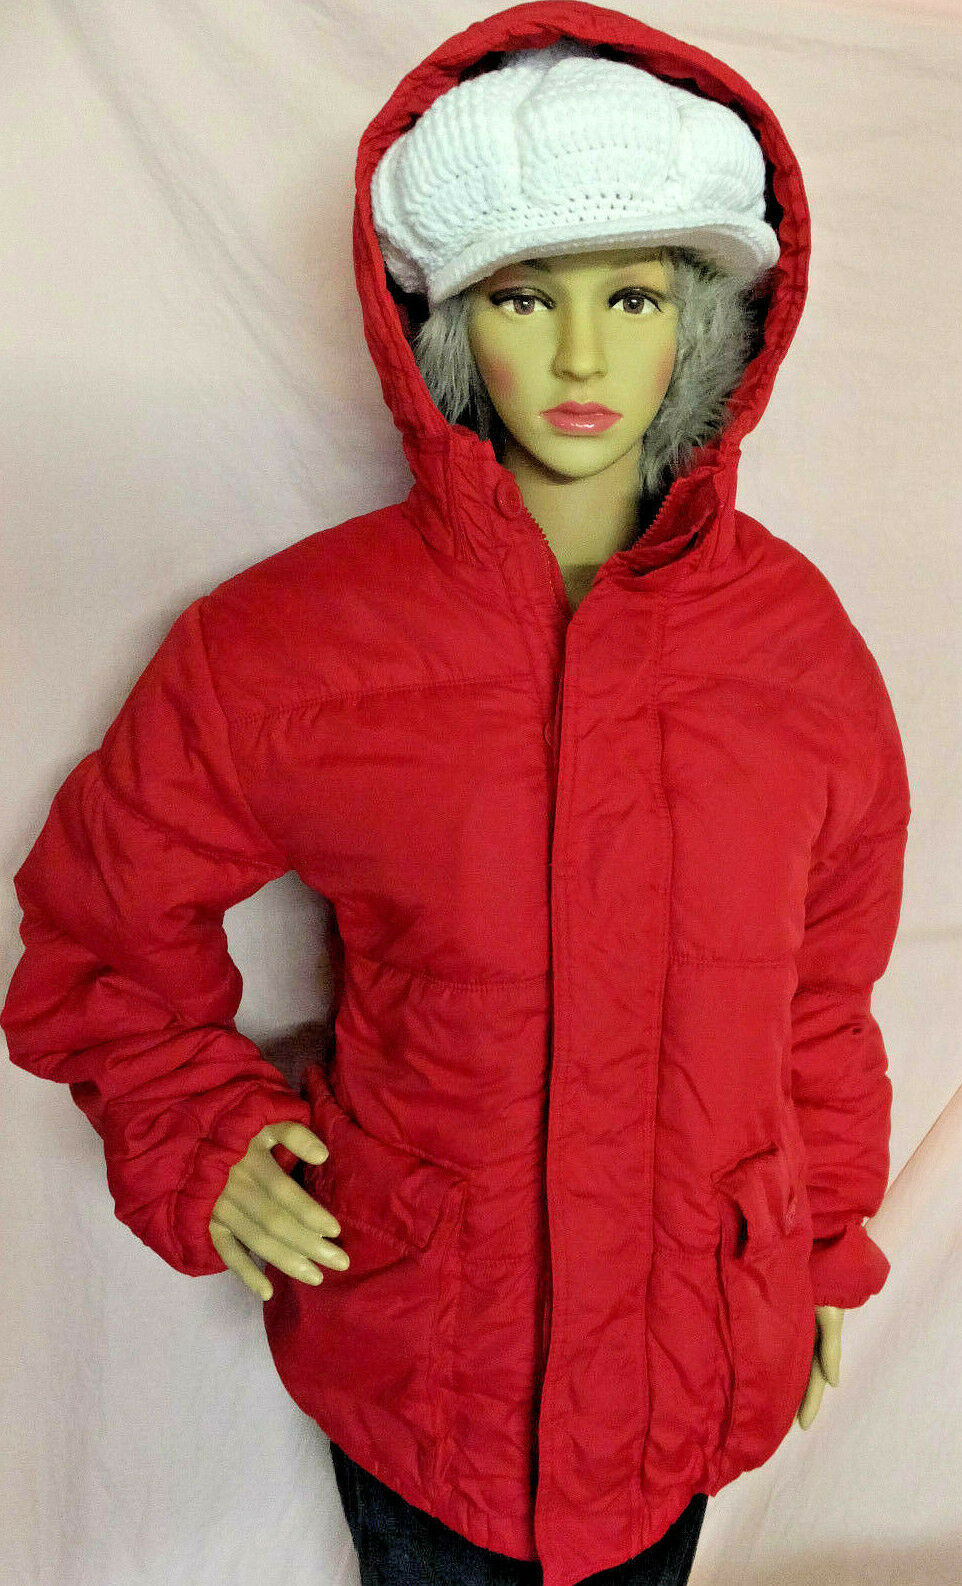 Aeropostale Womens Coat Winter Hooded with Button's Button's Button's and Zipper Aeropostale coats 1da0e1